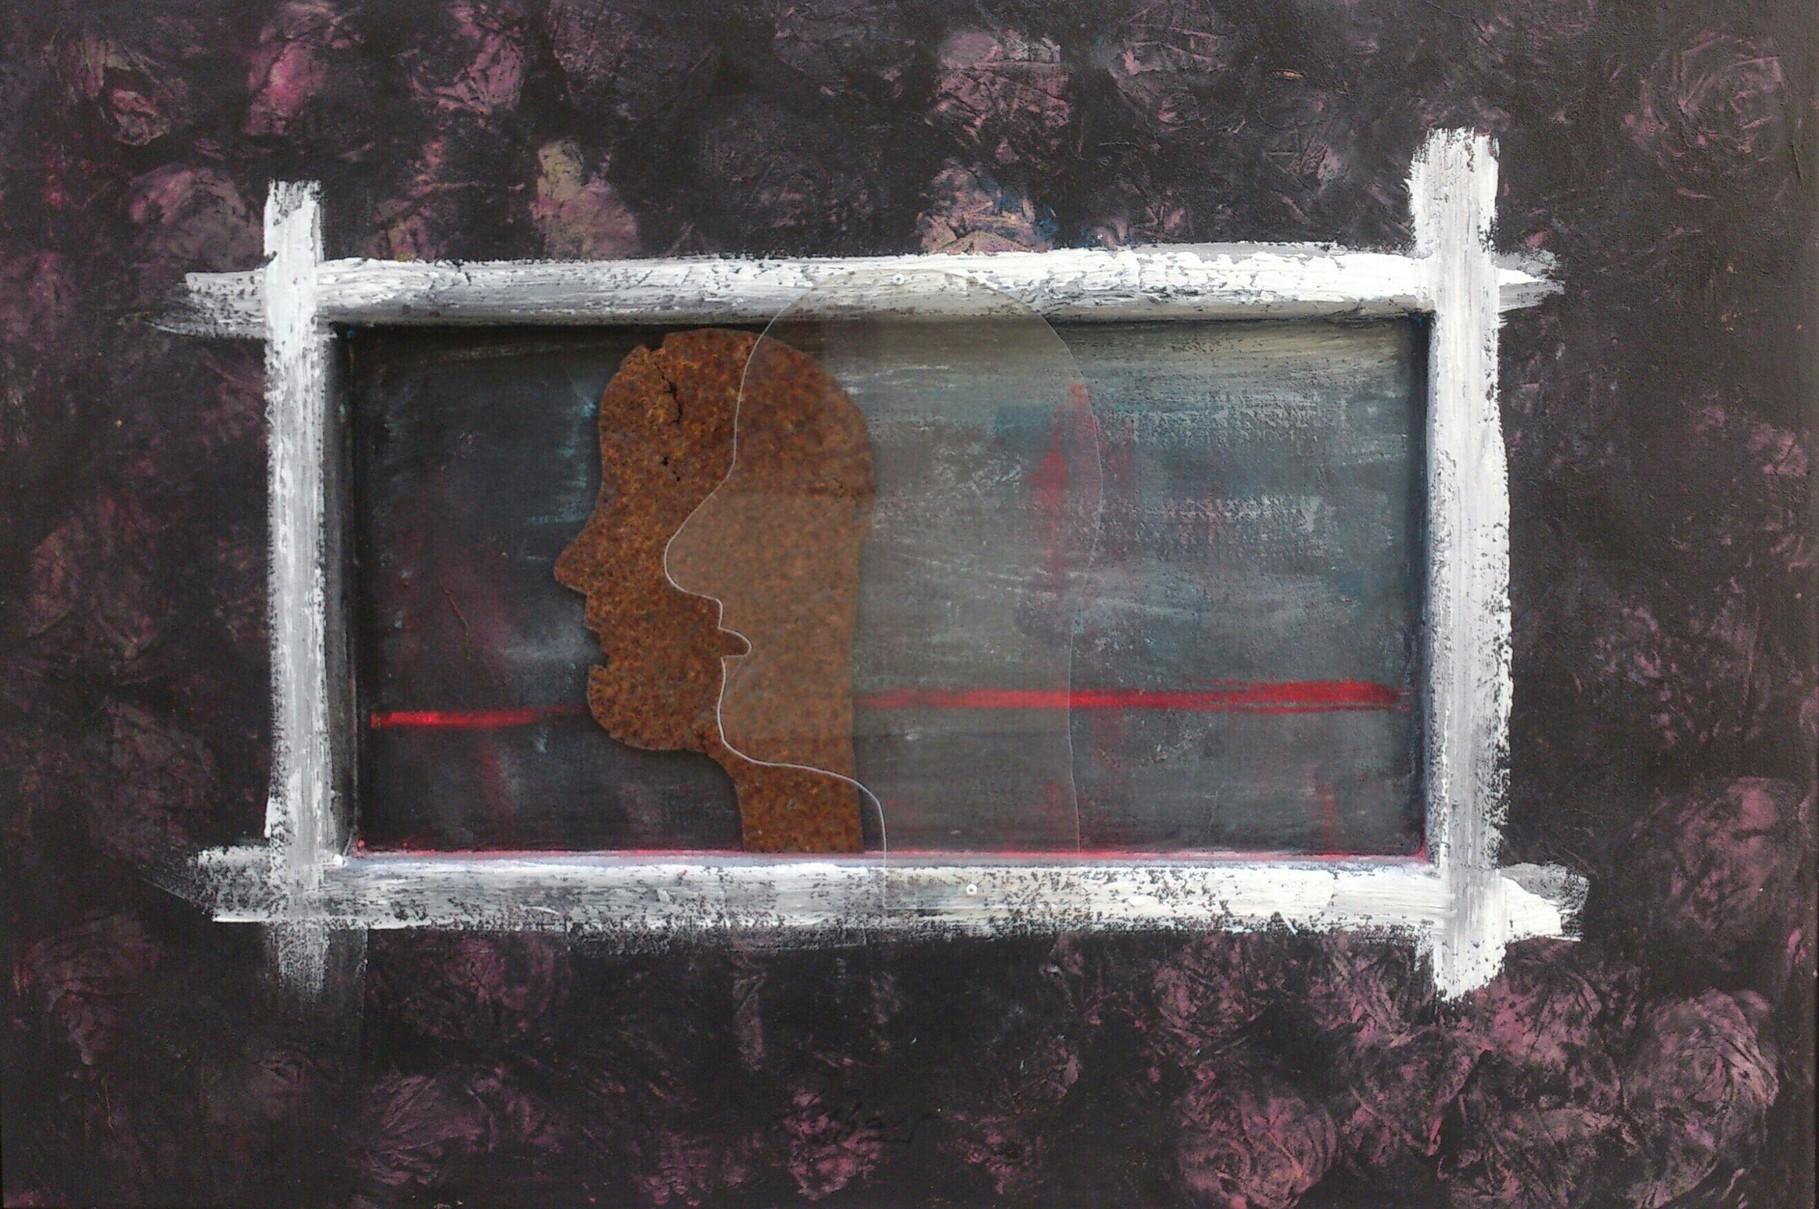 """Grauzone"" Acryl/Plexiglas/Blech auf Holz und Leinwand  70x100cm"